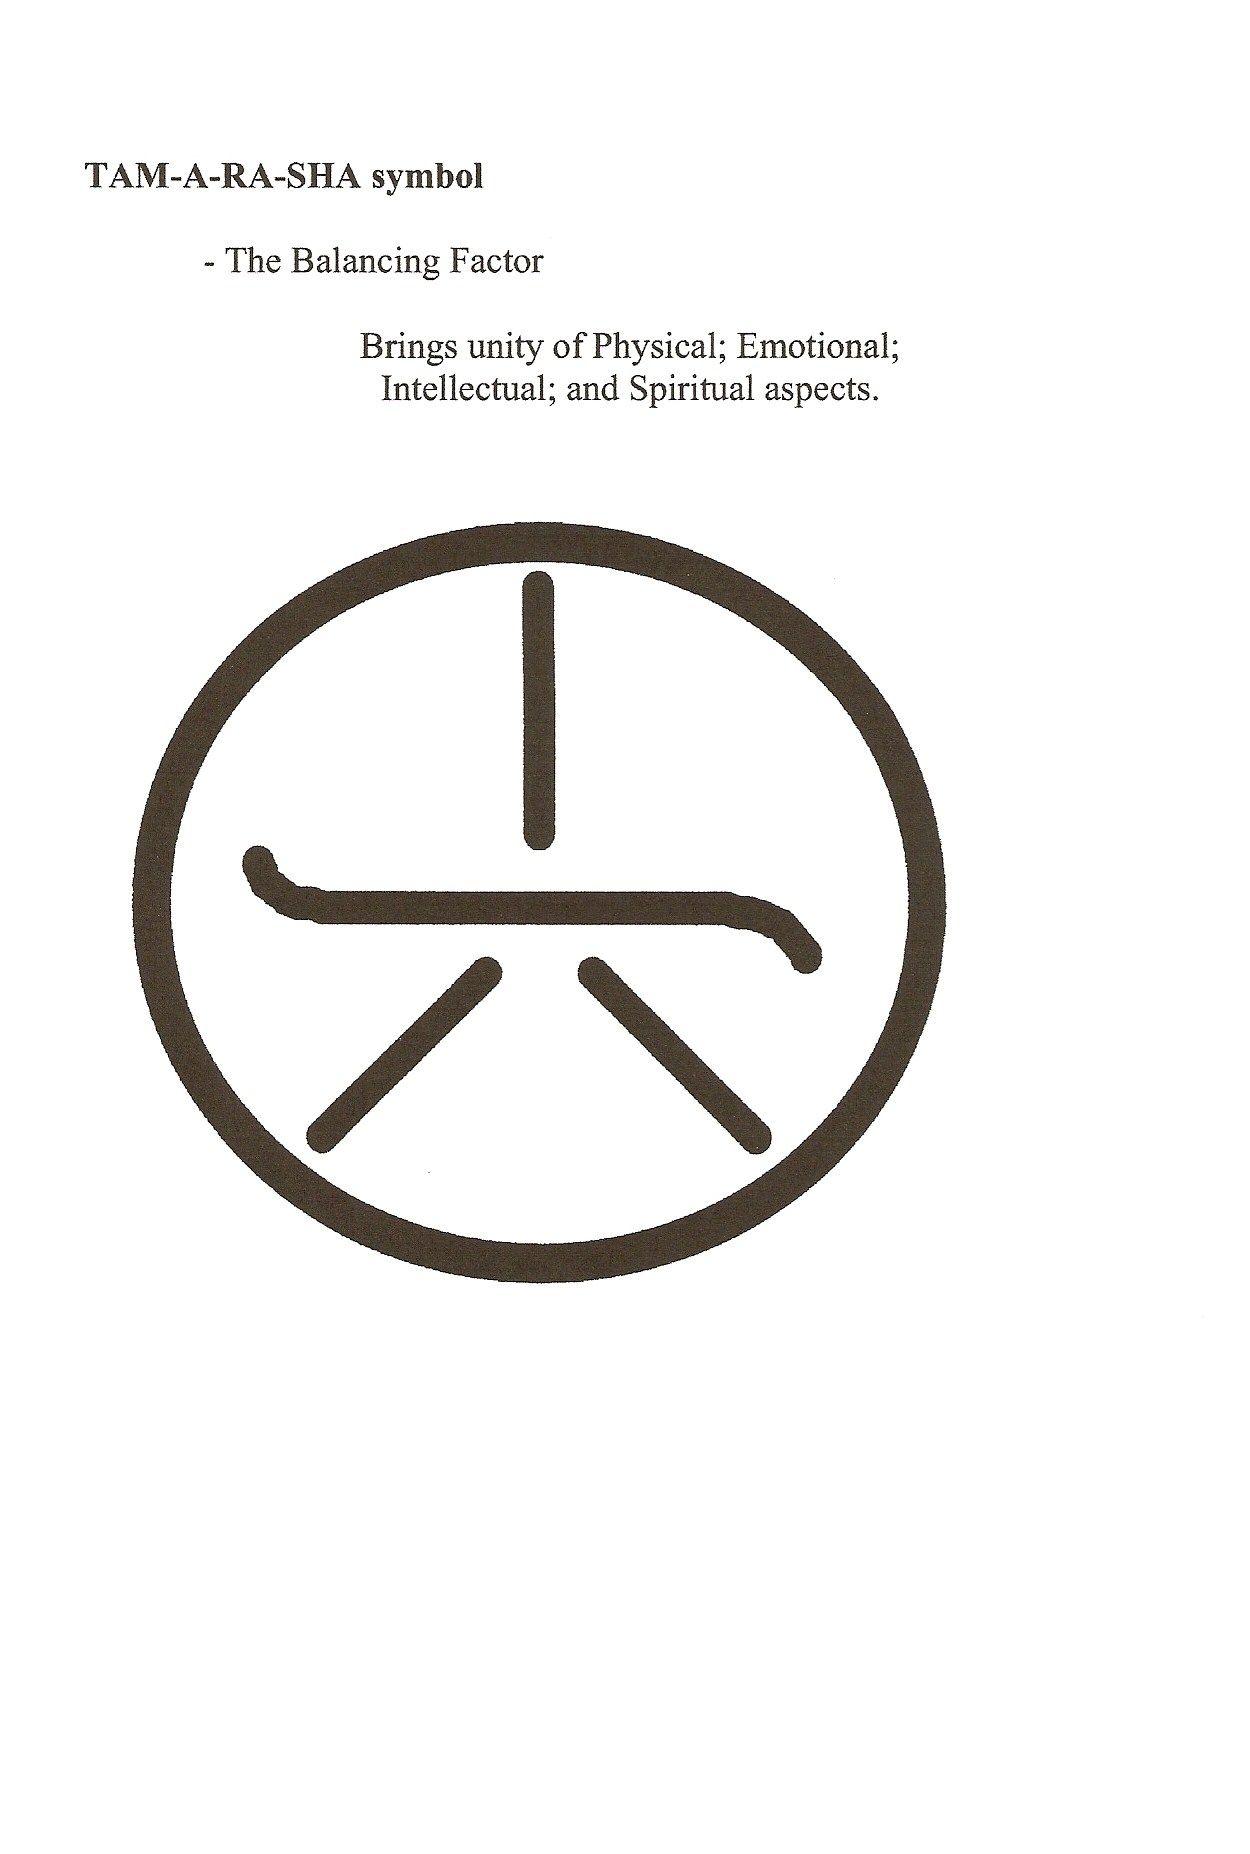 The reiki symbols what are they reiki symbols reiki healing symbols scan0005g buycottarizona Choice Image